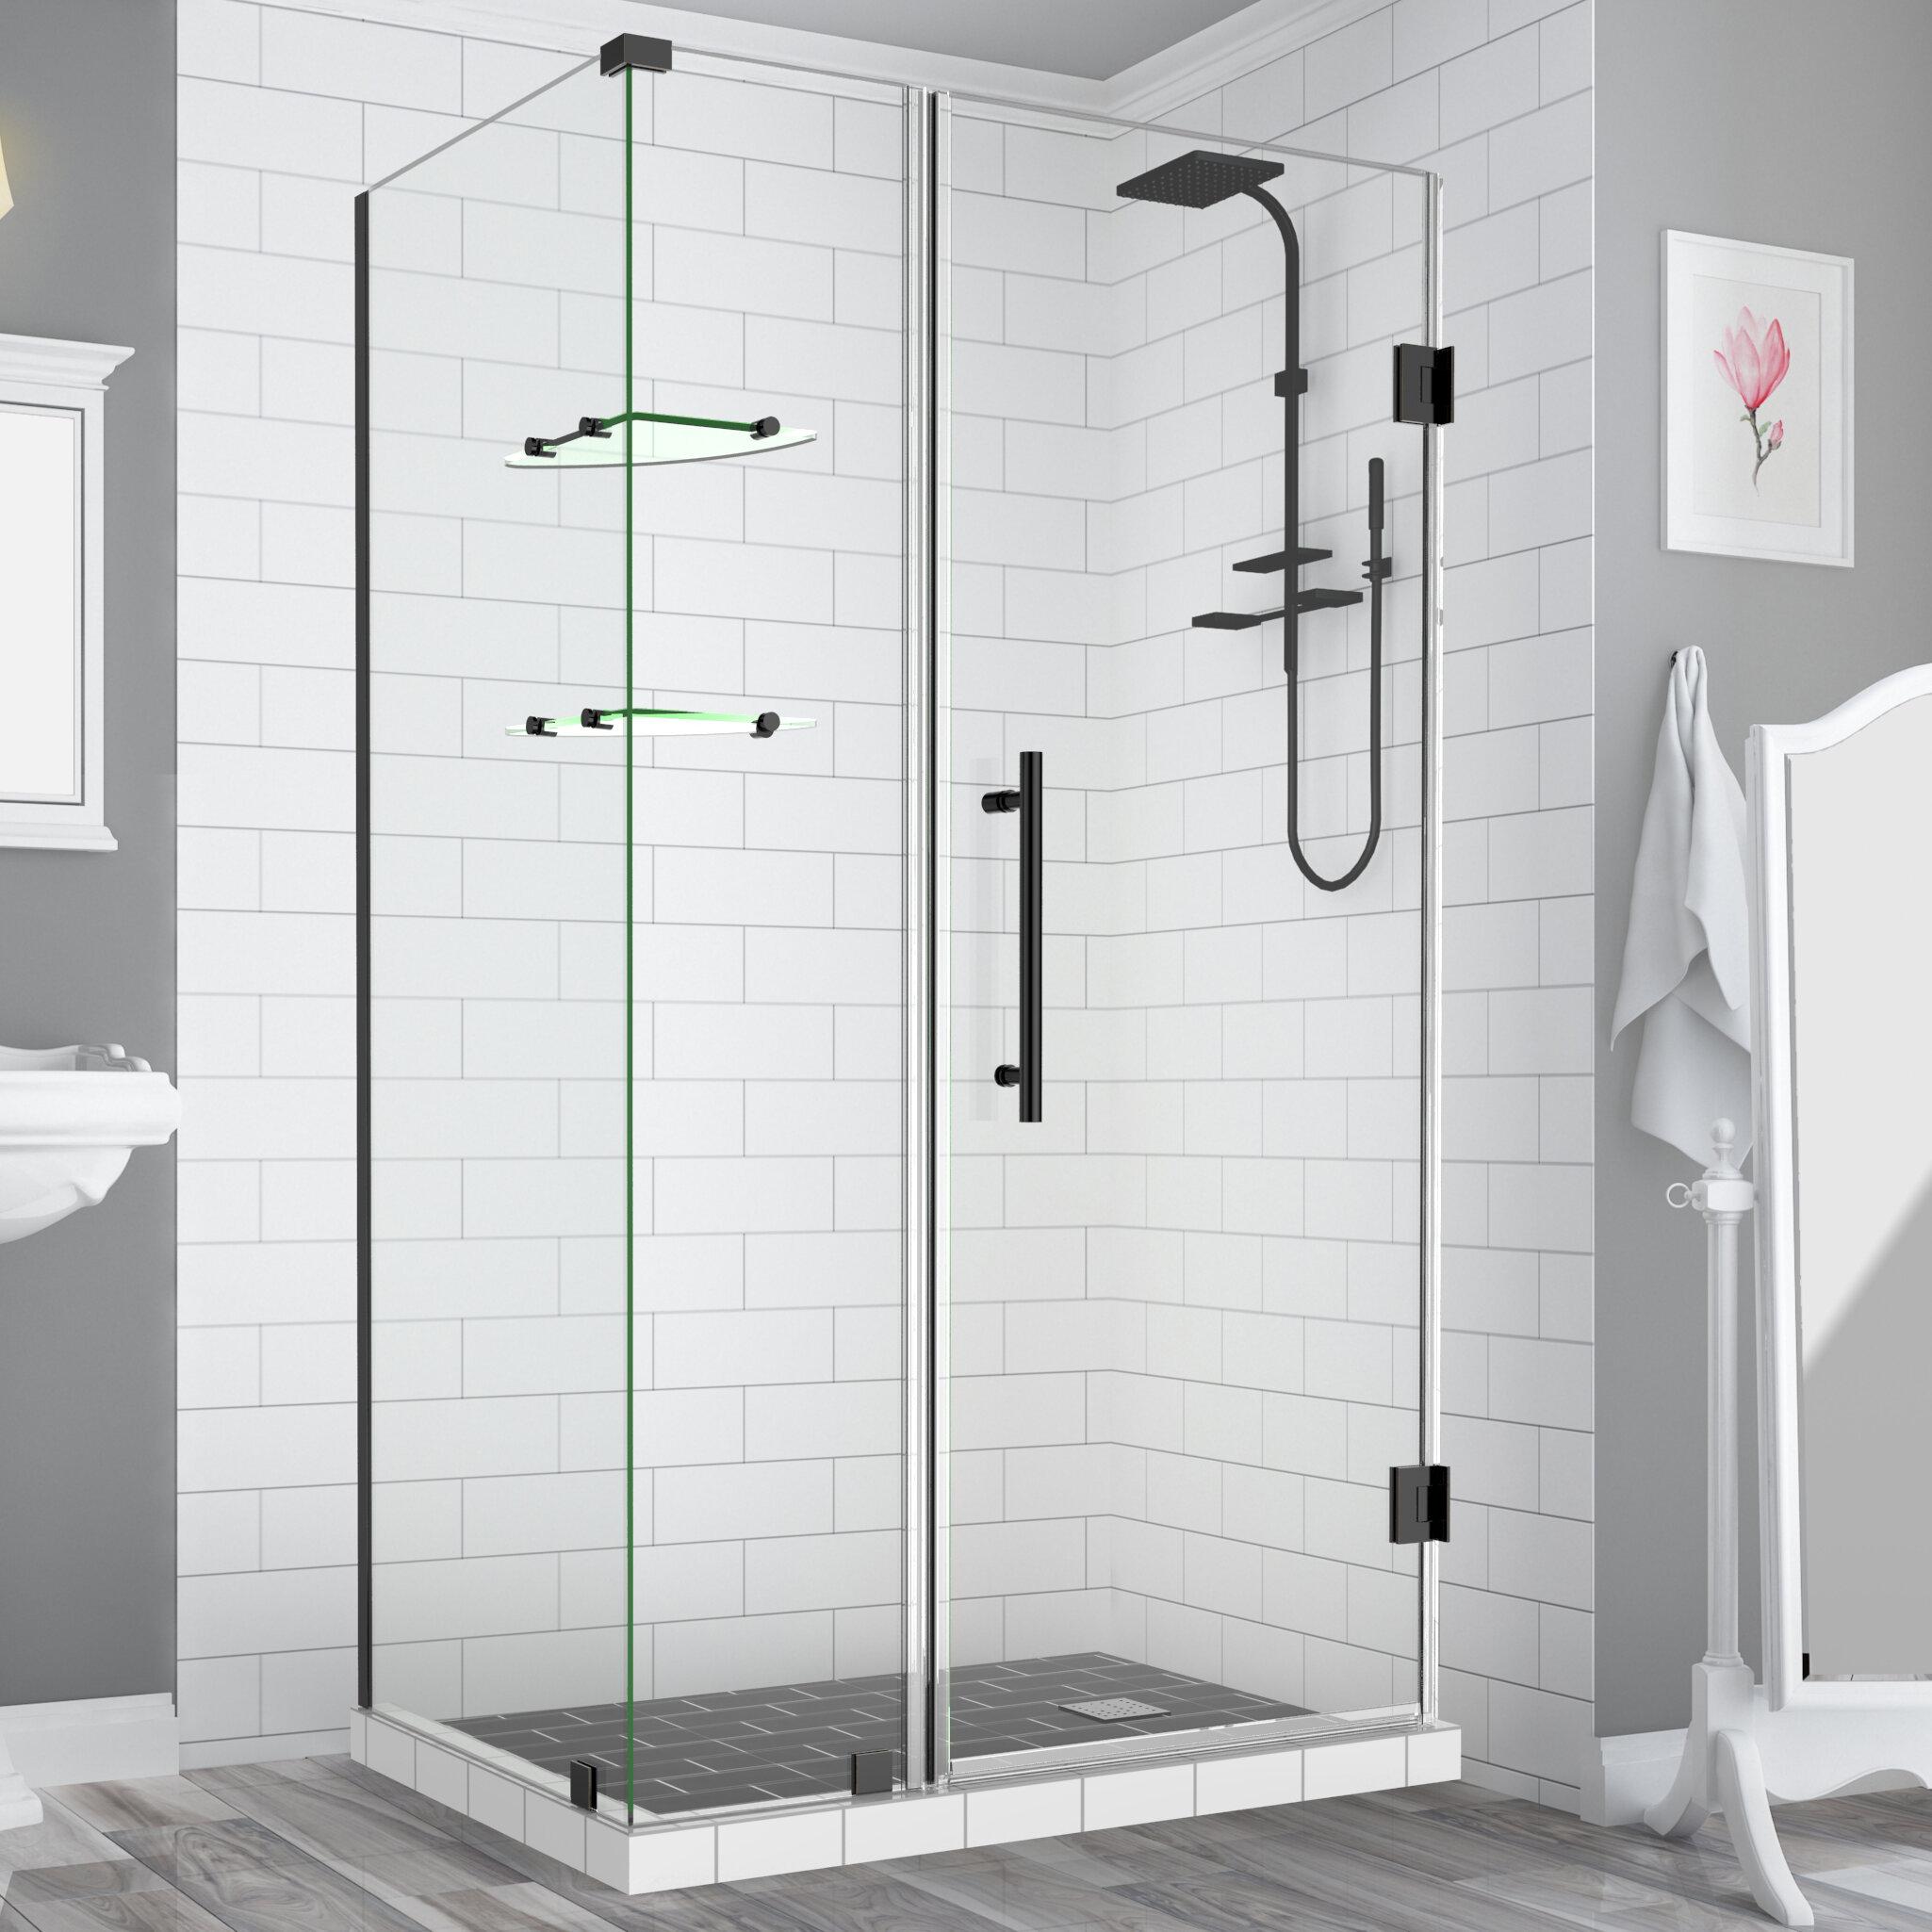 Aston Bromley Gs Frameless 50 25 X 72 Rectangle Hinged Shower Enclosure With Glass Shelves Wayfair